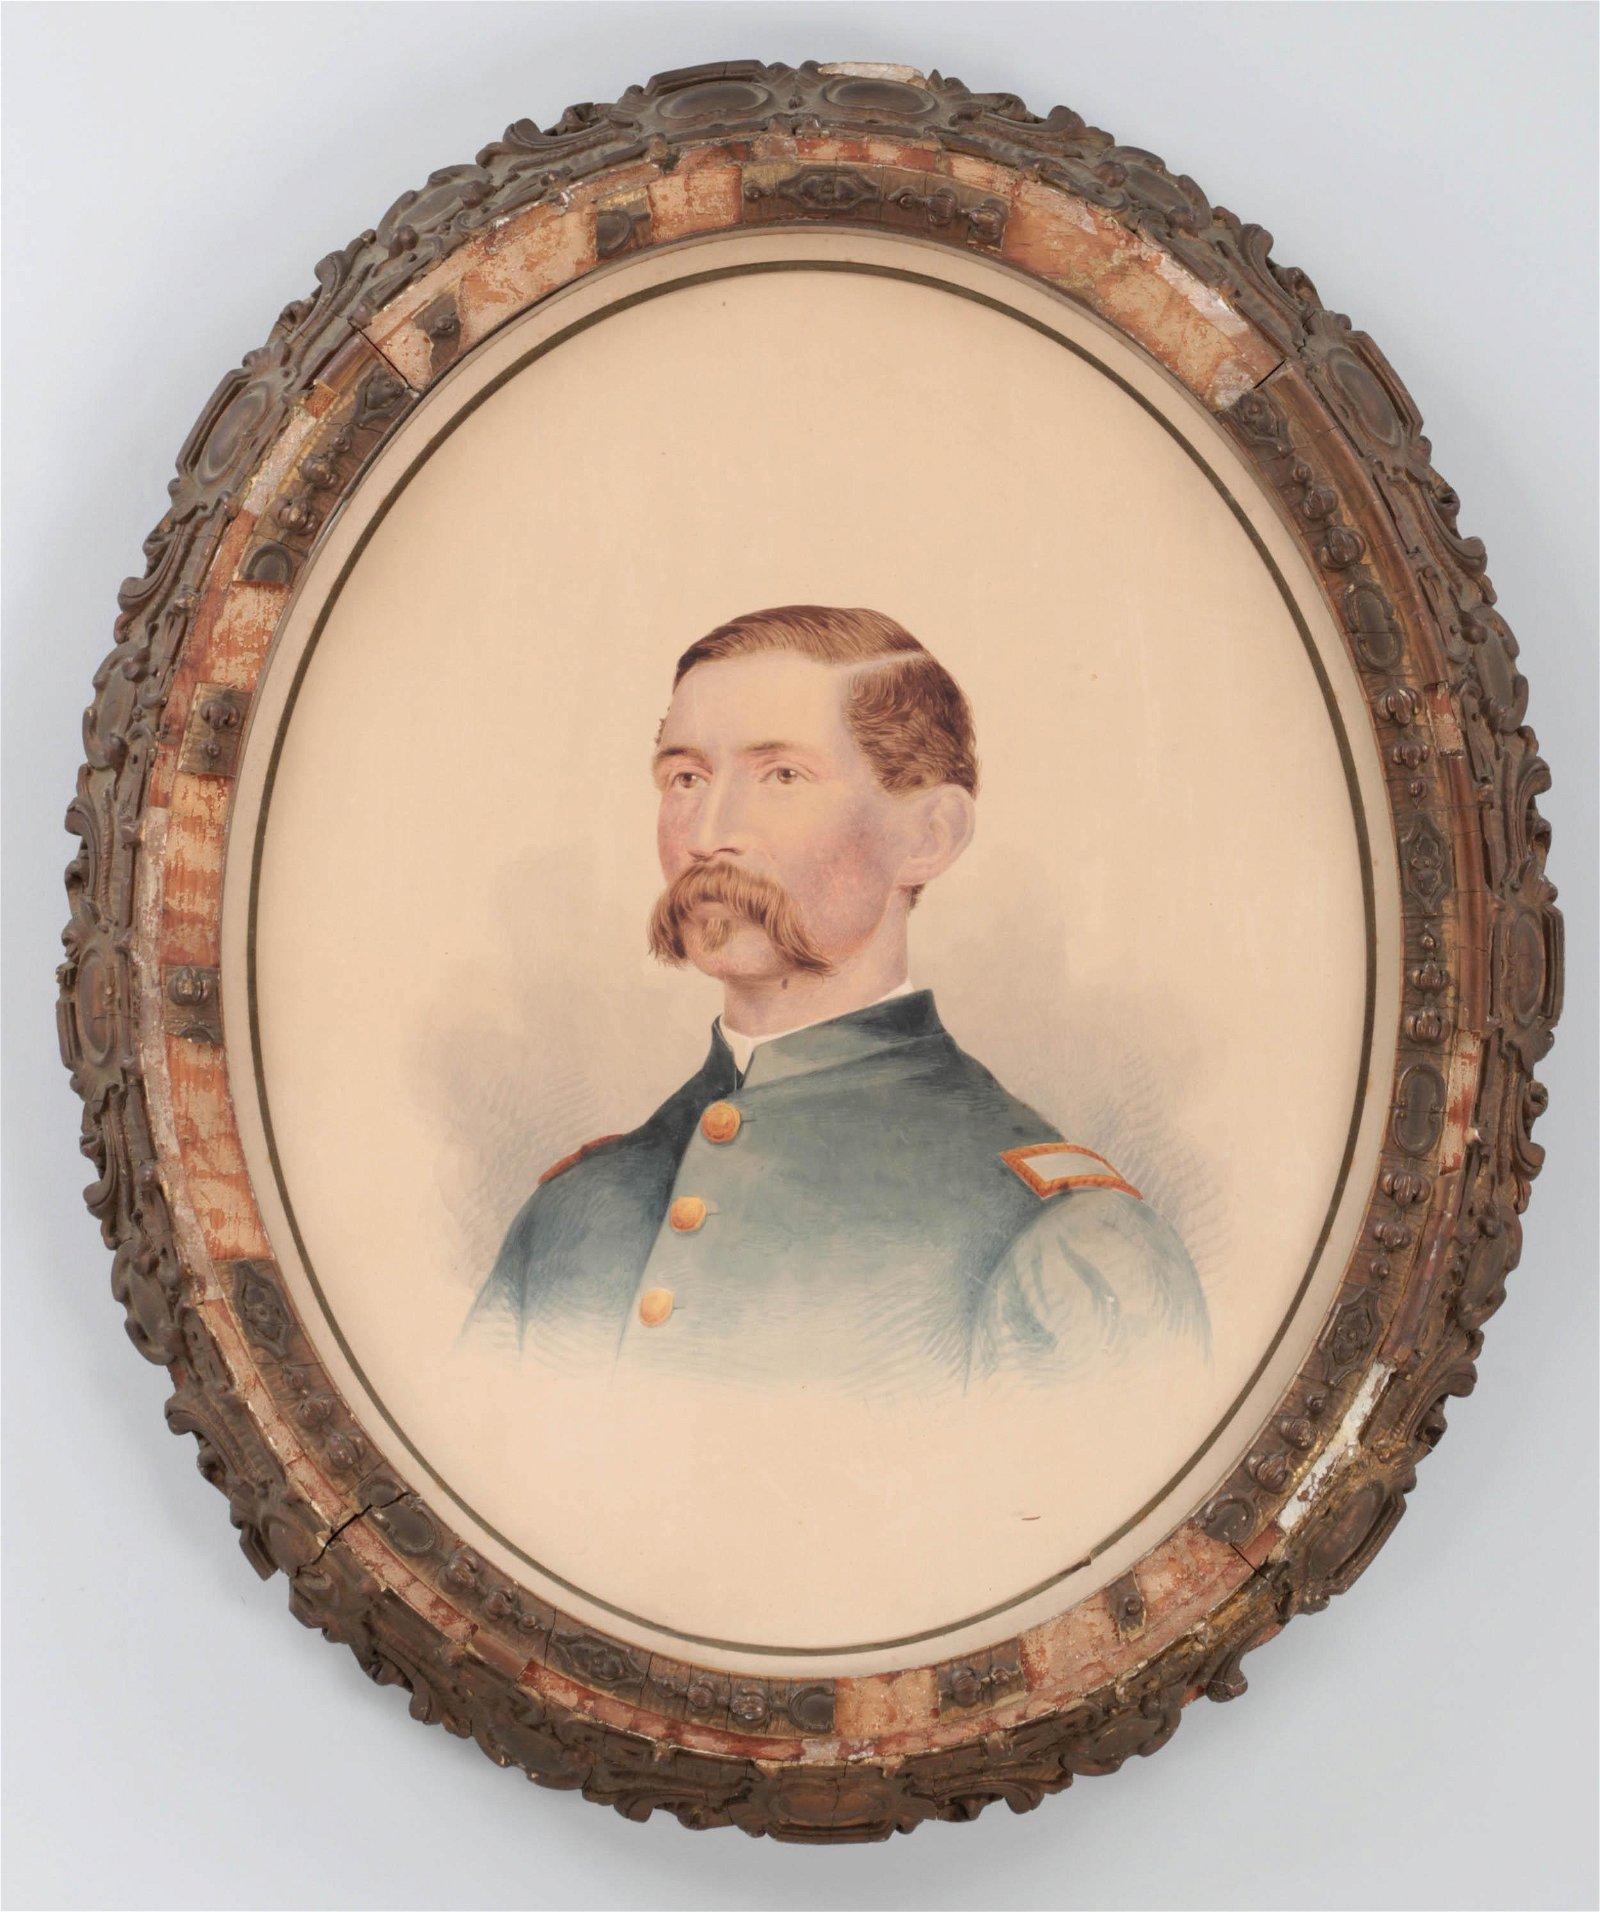 U.S. Civil war soldier portrait